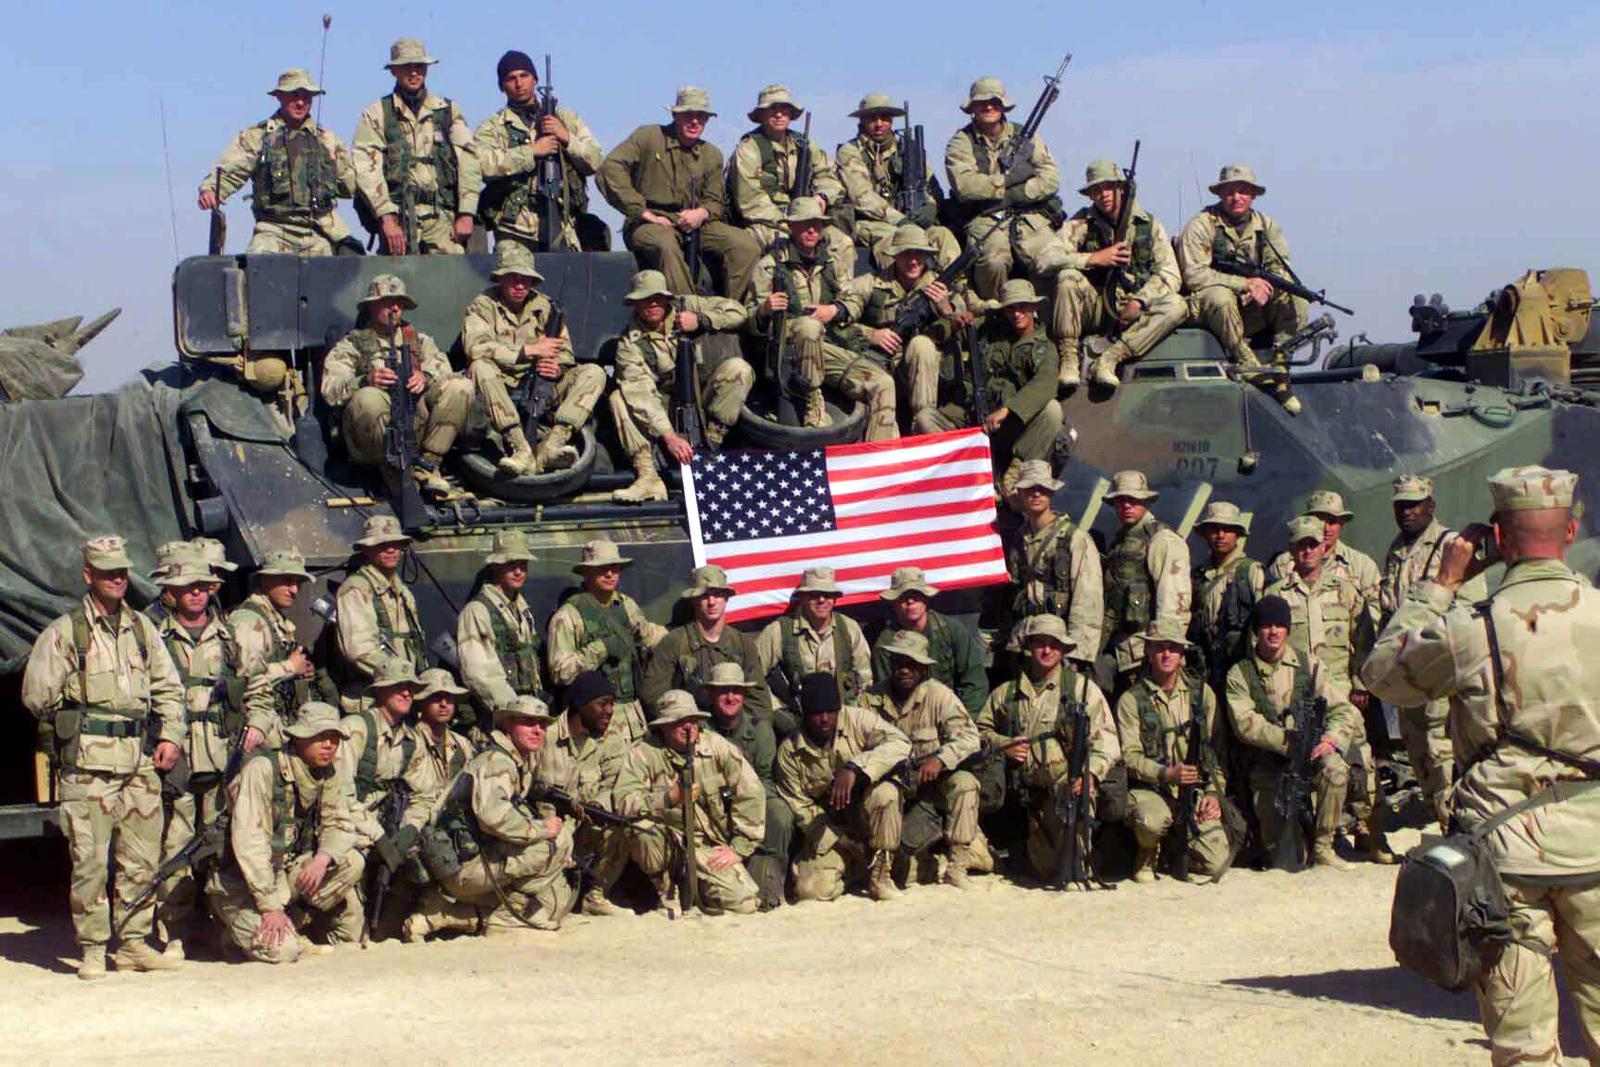 US Marine Corps (USMC) Marines with the Amphibious Assault Vehicles, Bravo  Company, 1ST Battalion, 7th Marines,